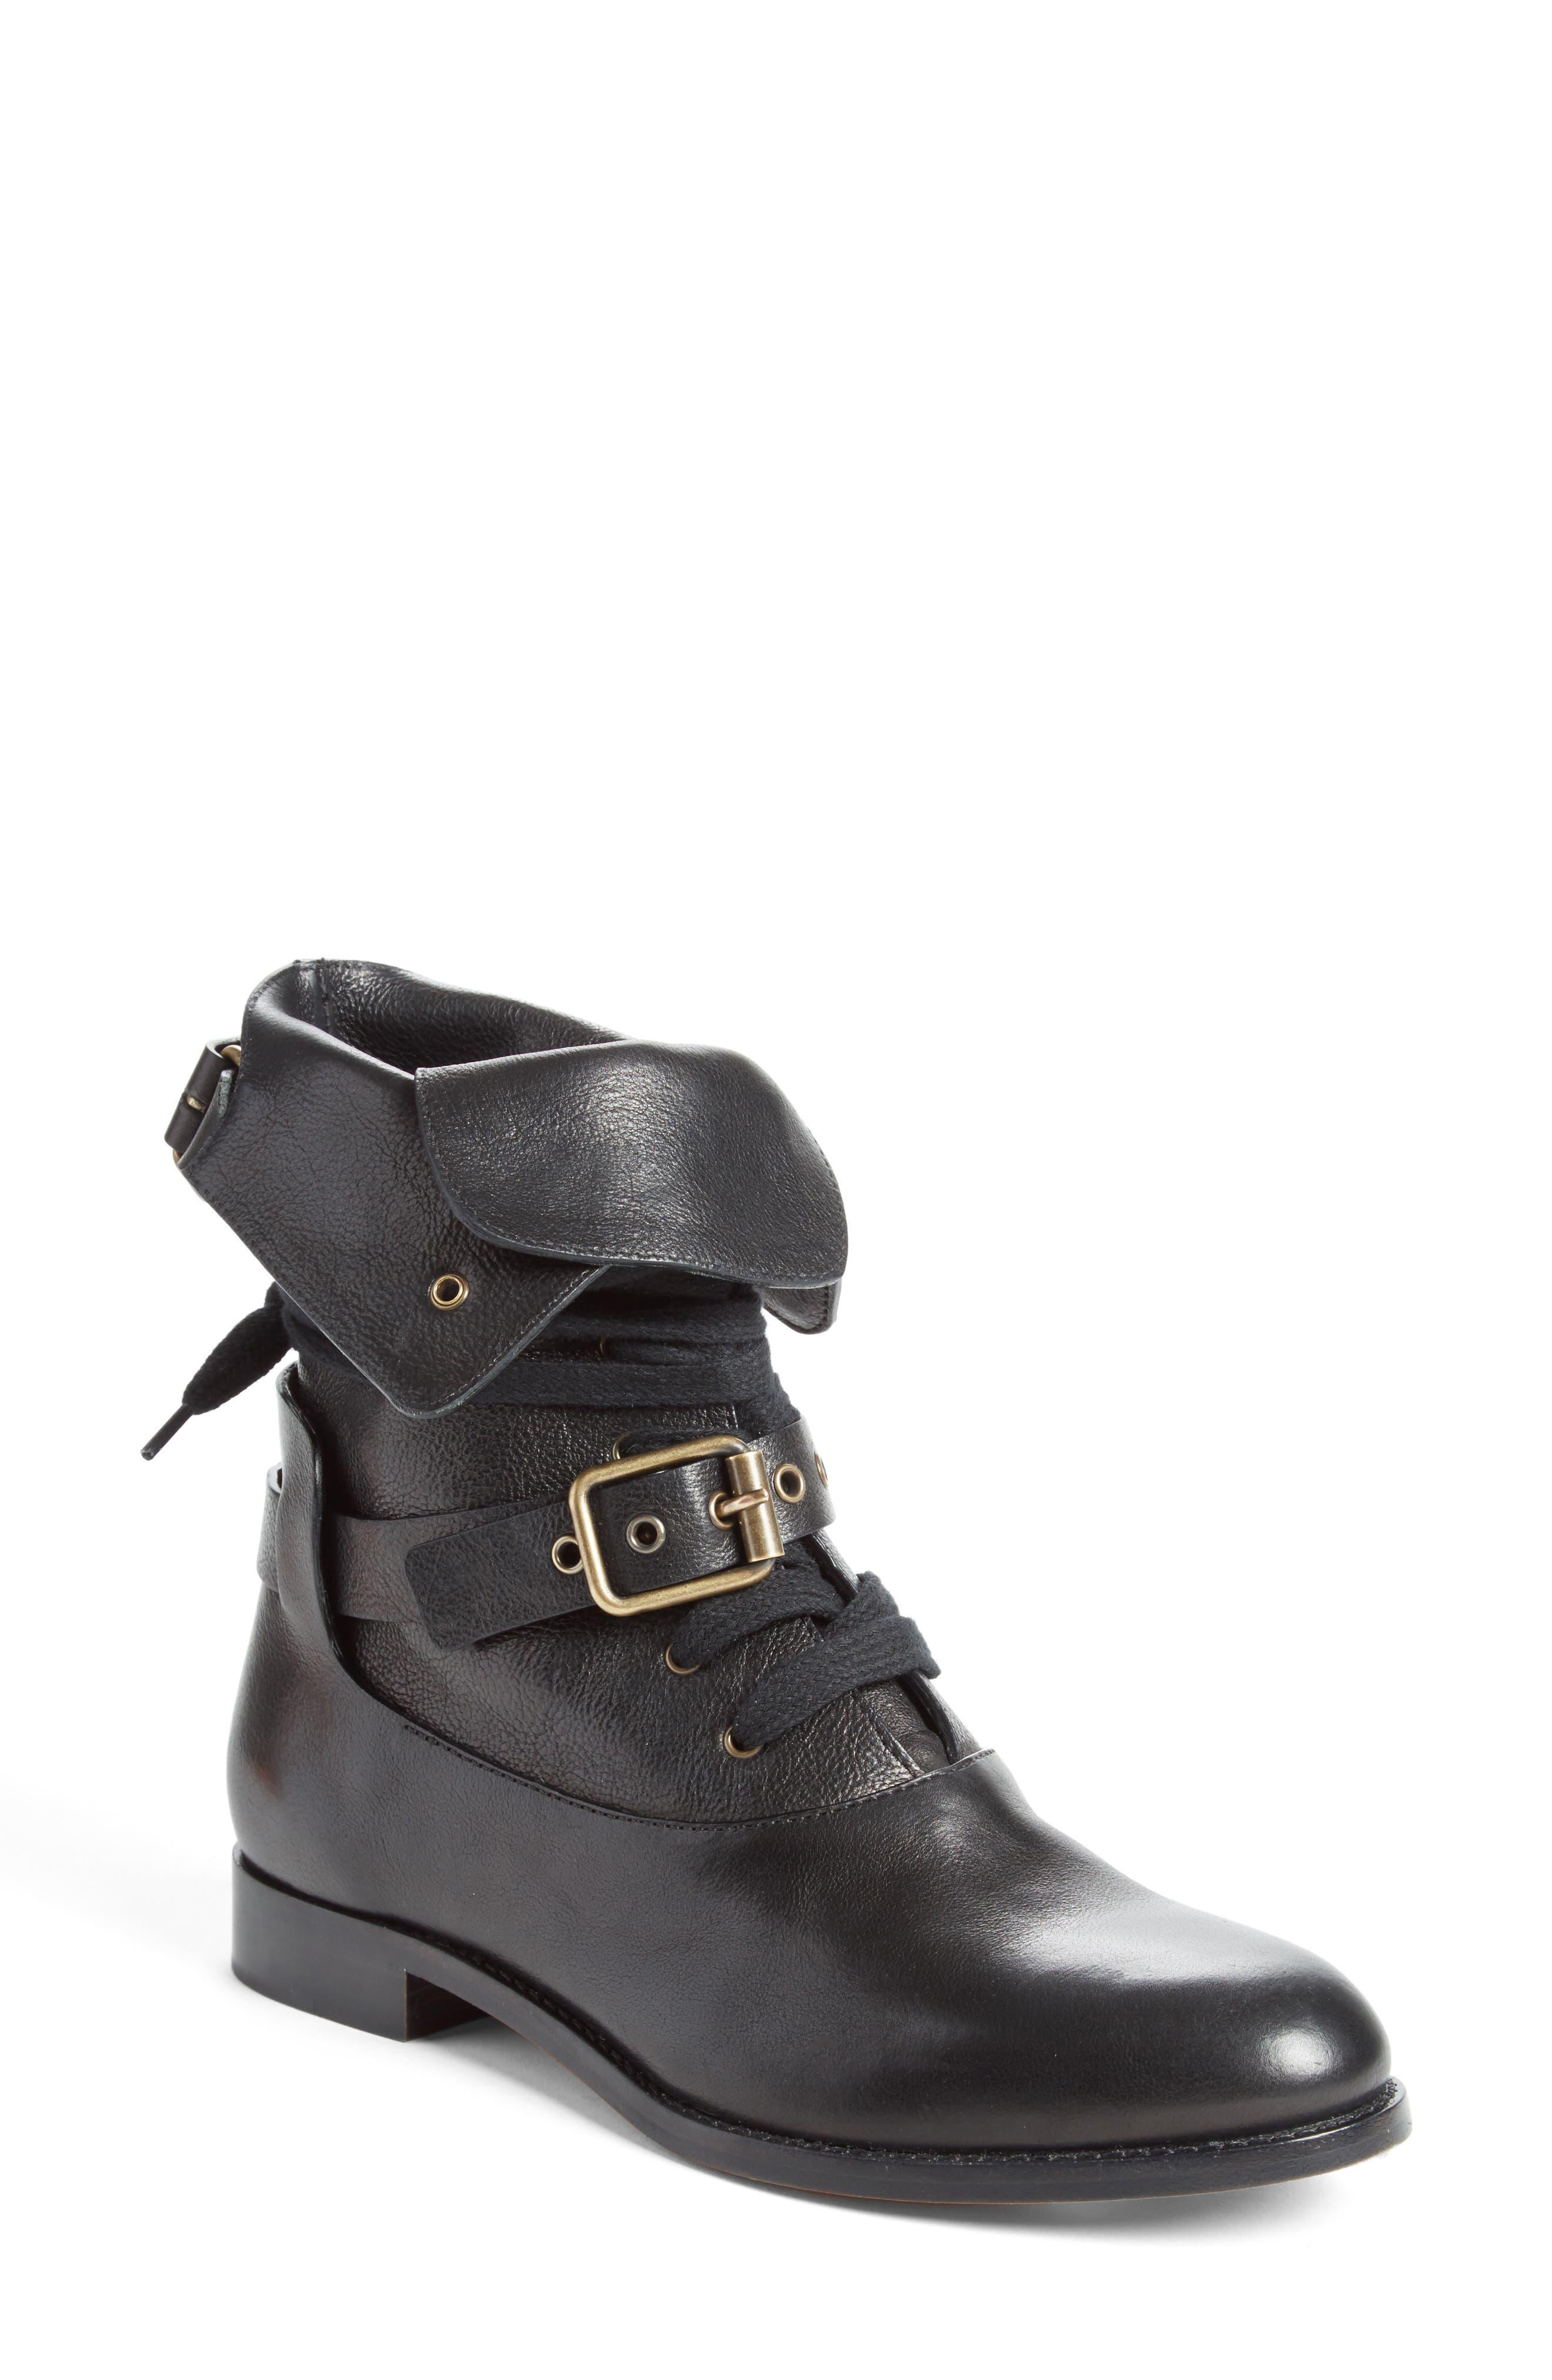 Alternate Image 1 Selected - Chloé Otto Convertible Boot (Women)